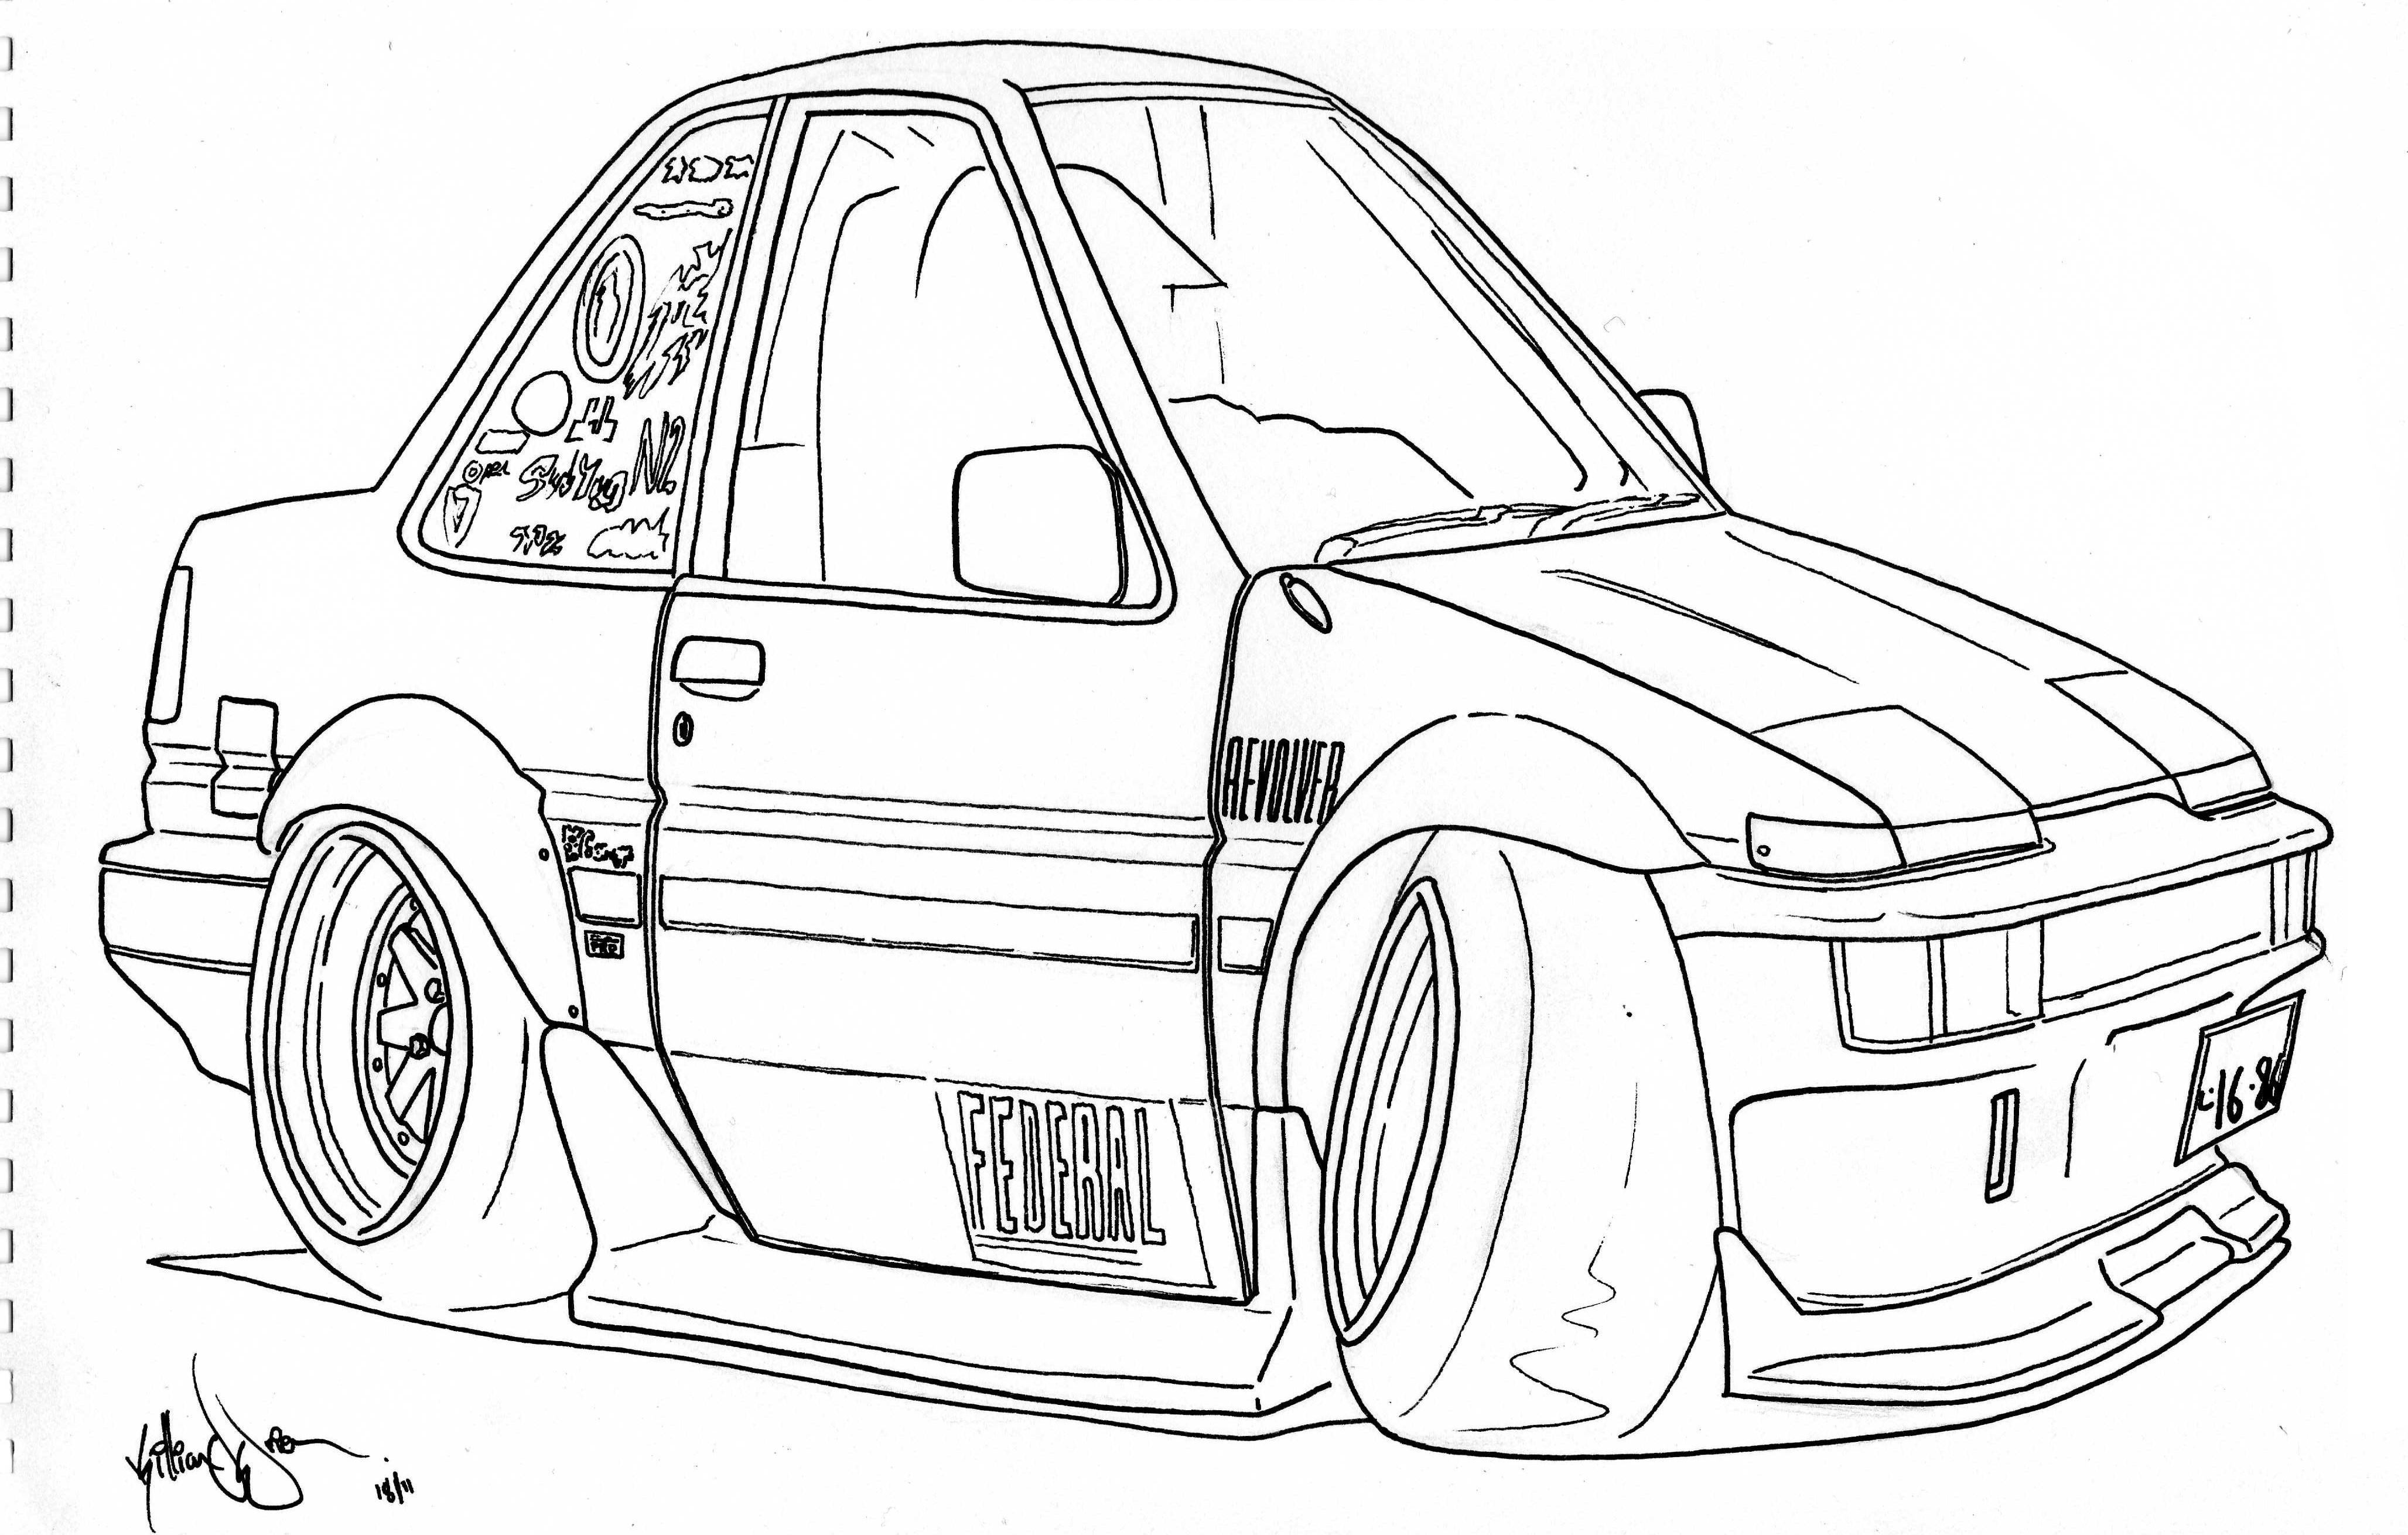 Drawn vehicle caricature K T E O K